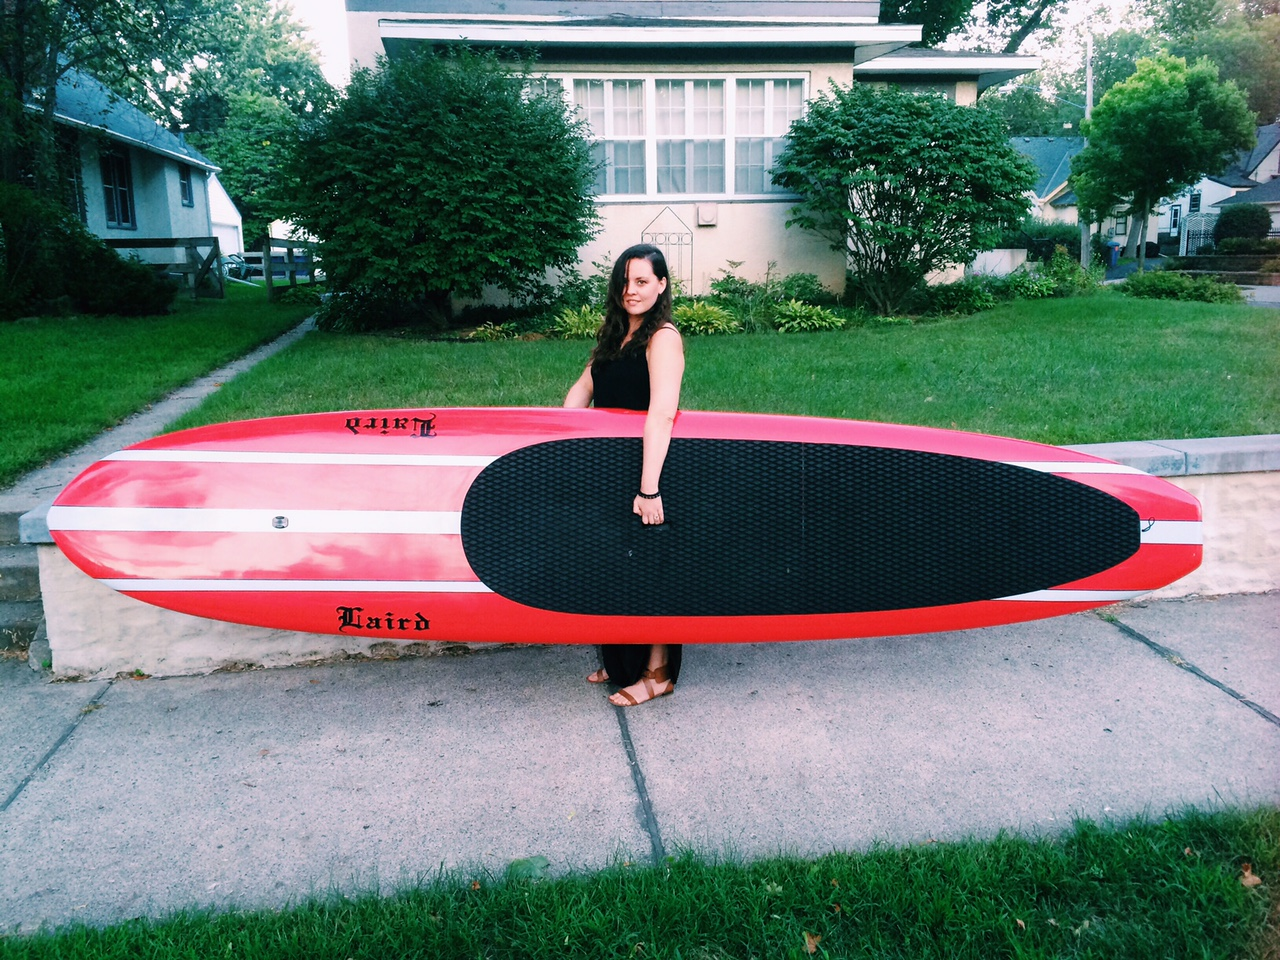 My new paddleboard